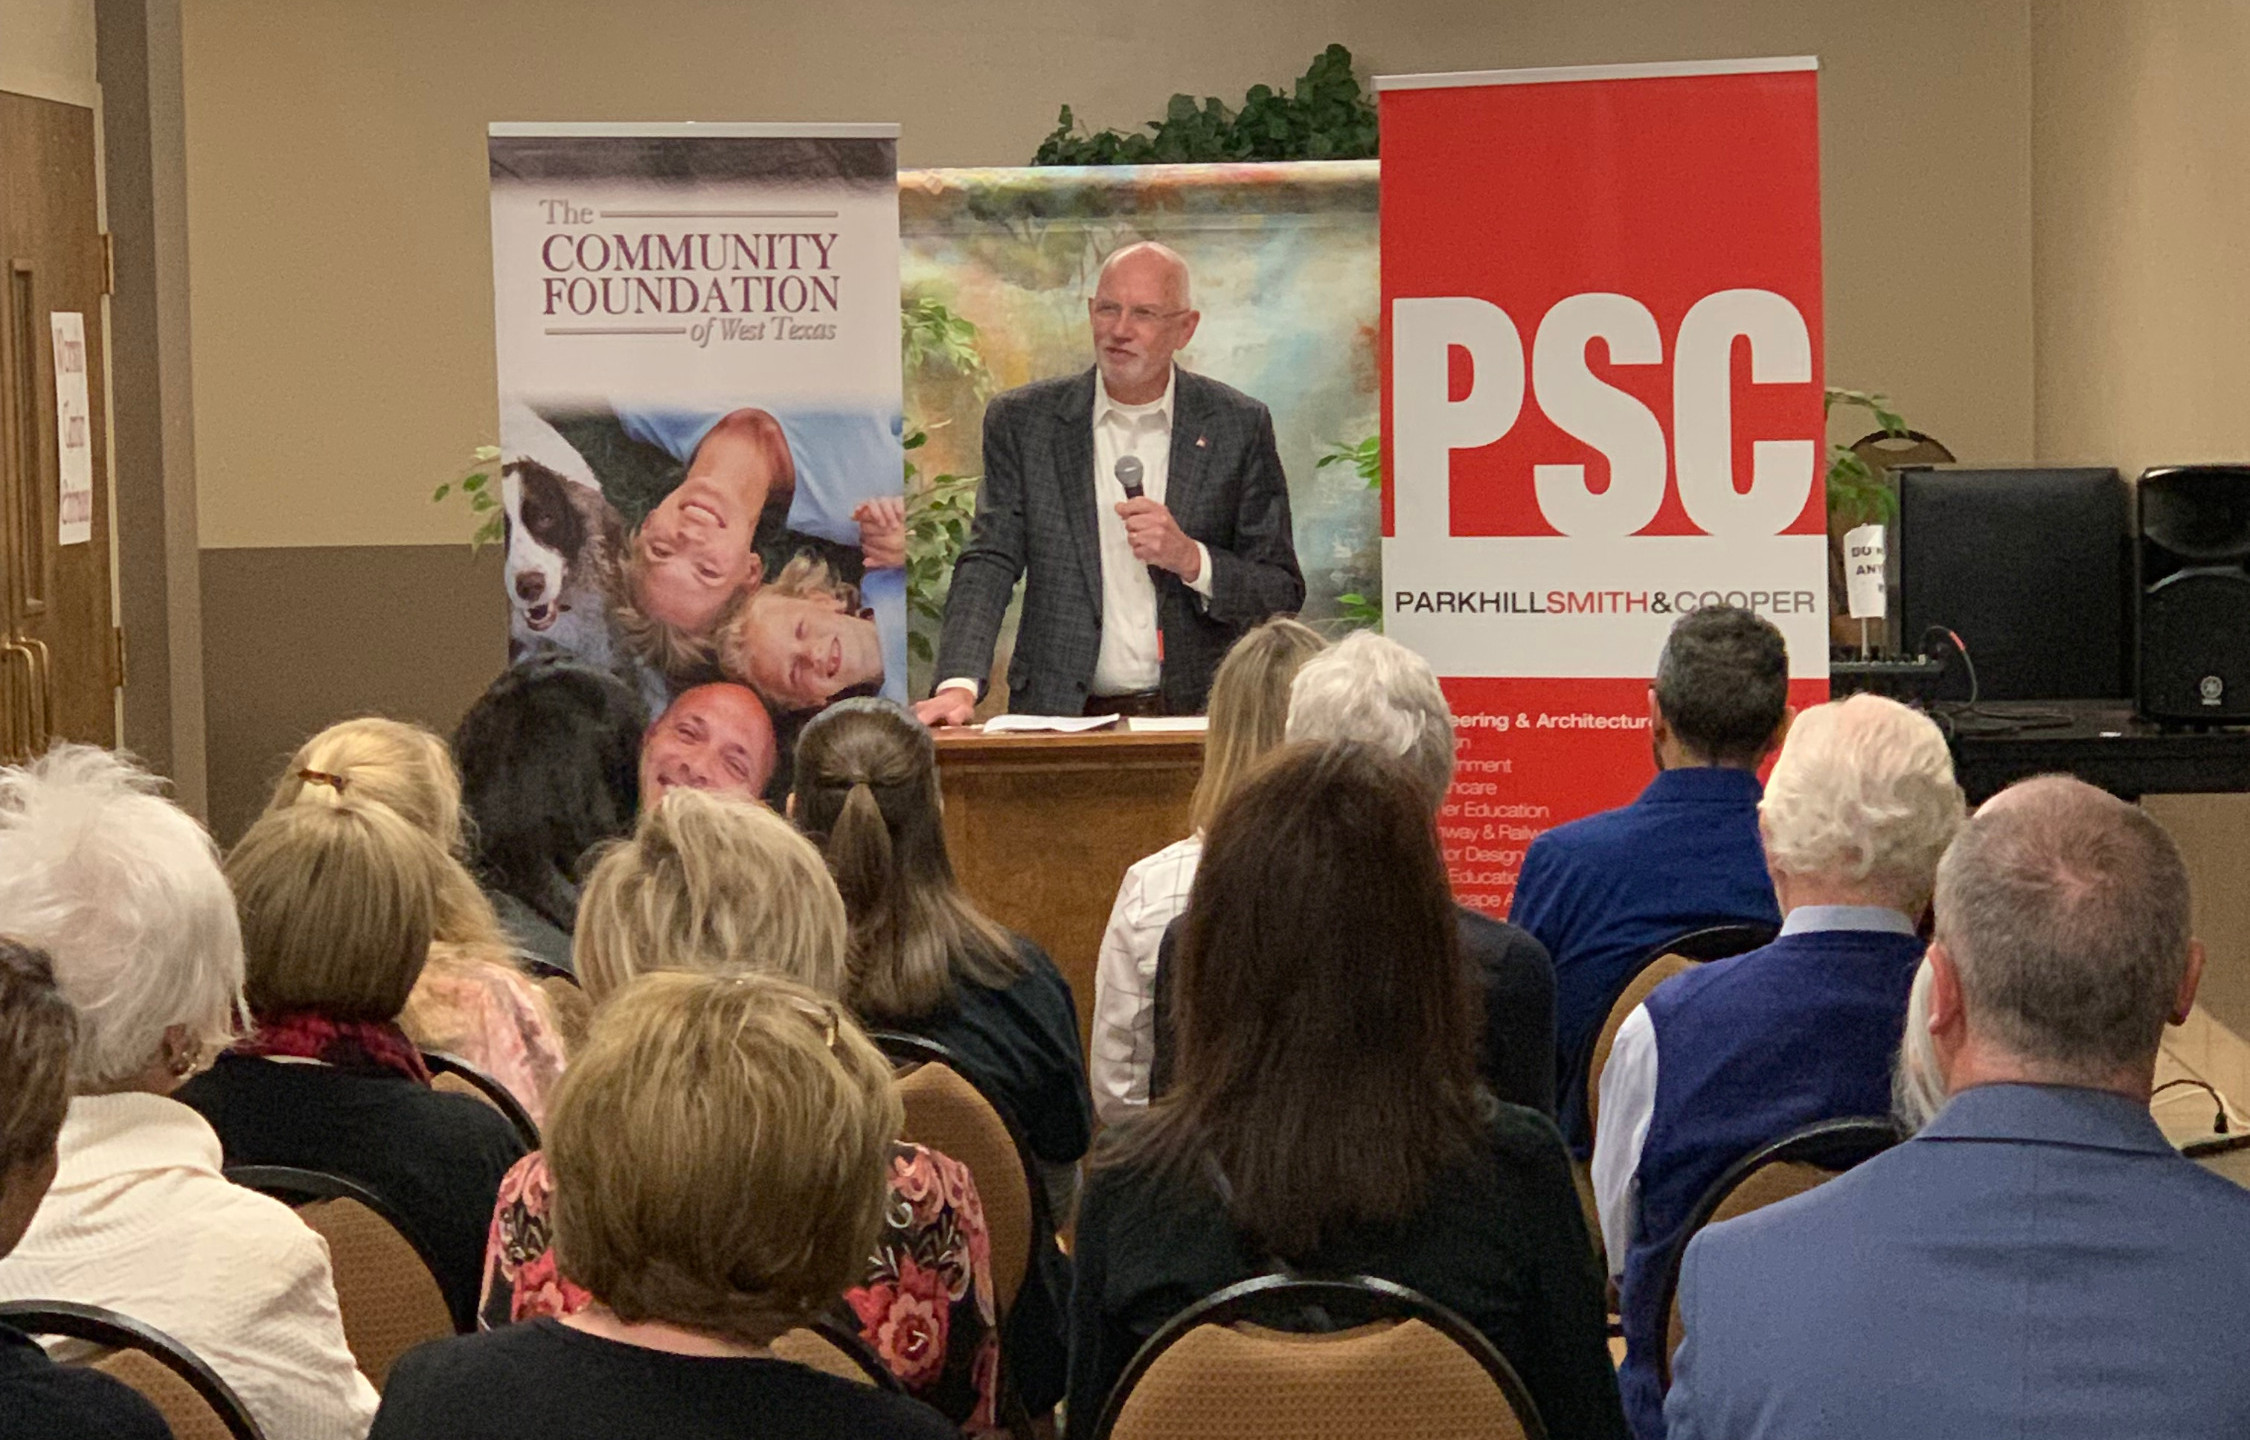 Joe Rapier, PSC President/CEO